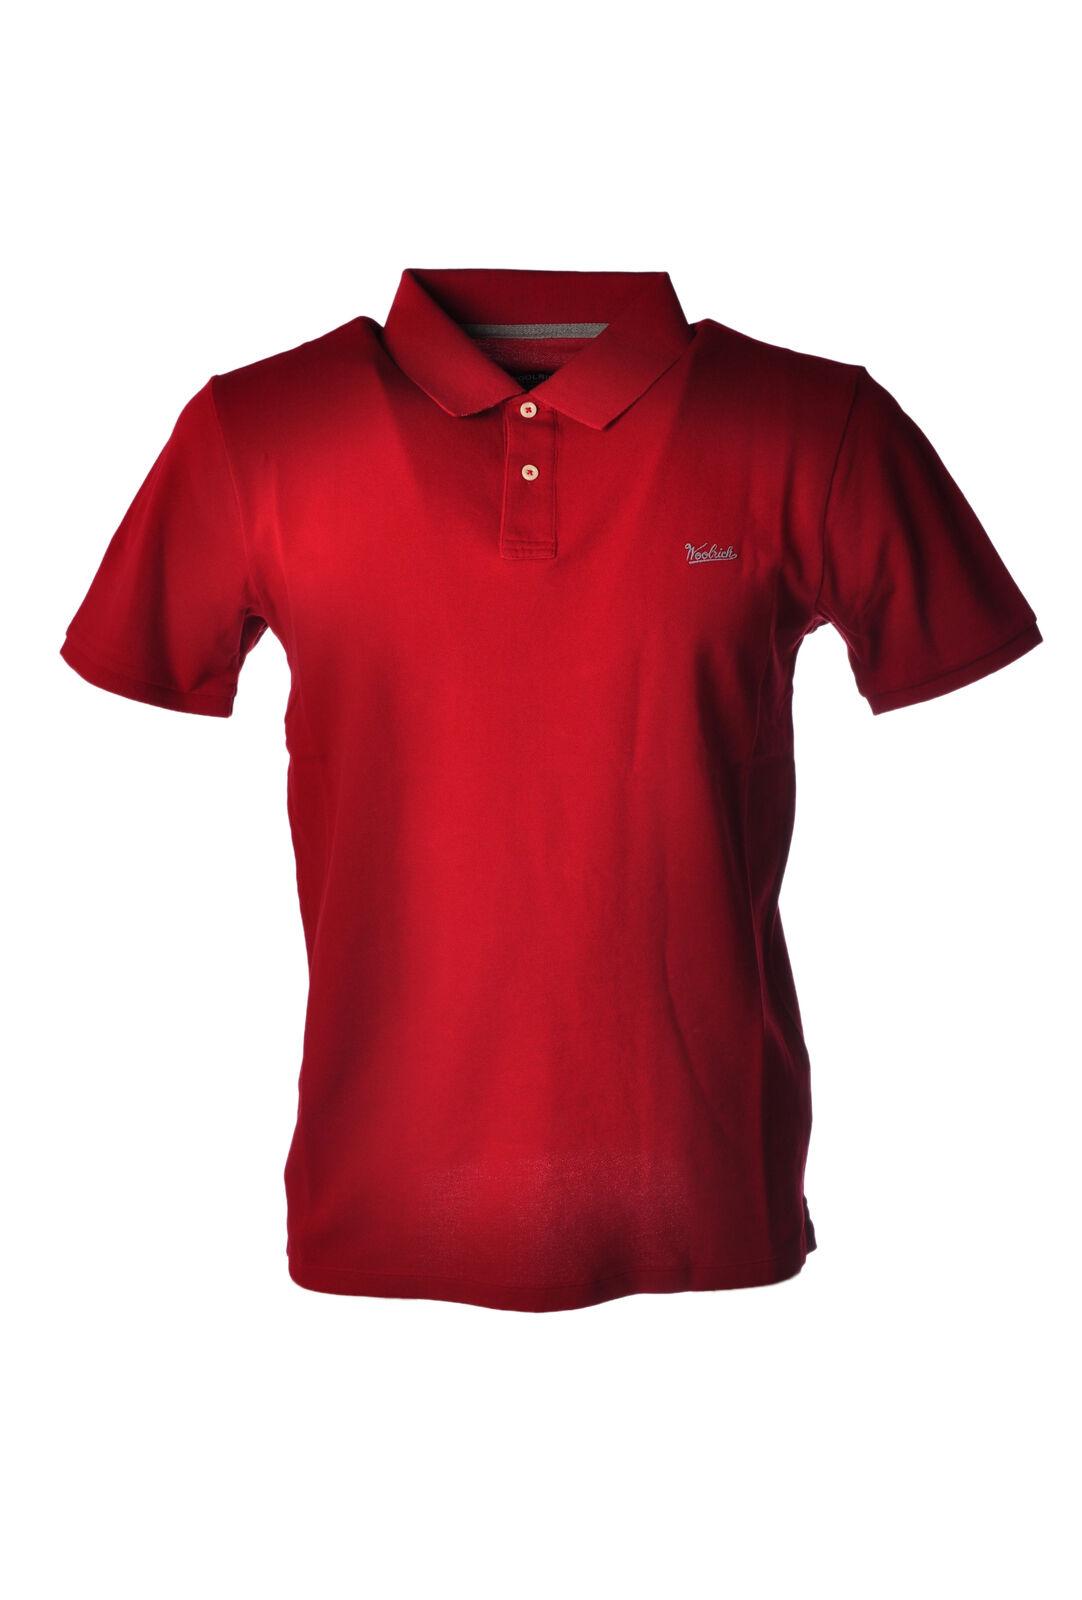 Wollerich - obenwear-Polo - Man - rot - 5018903H190921